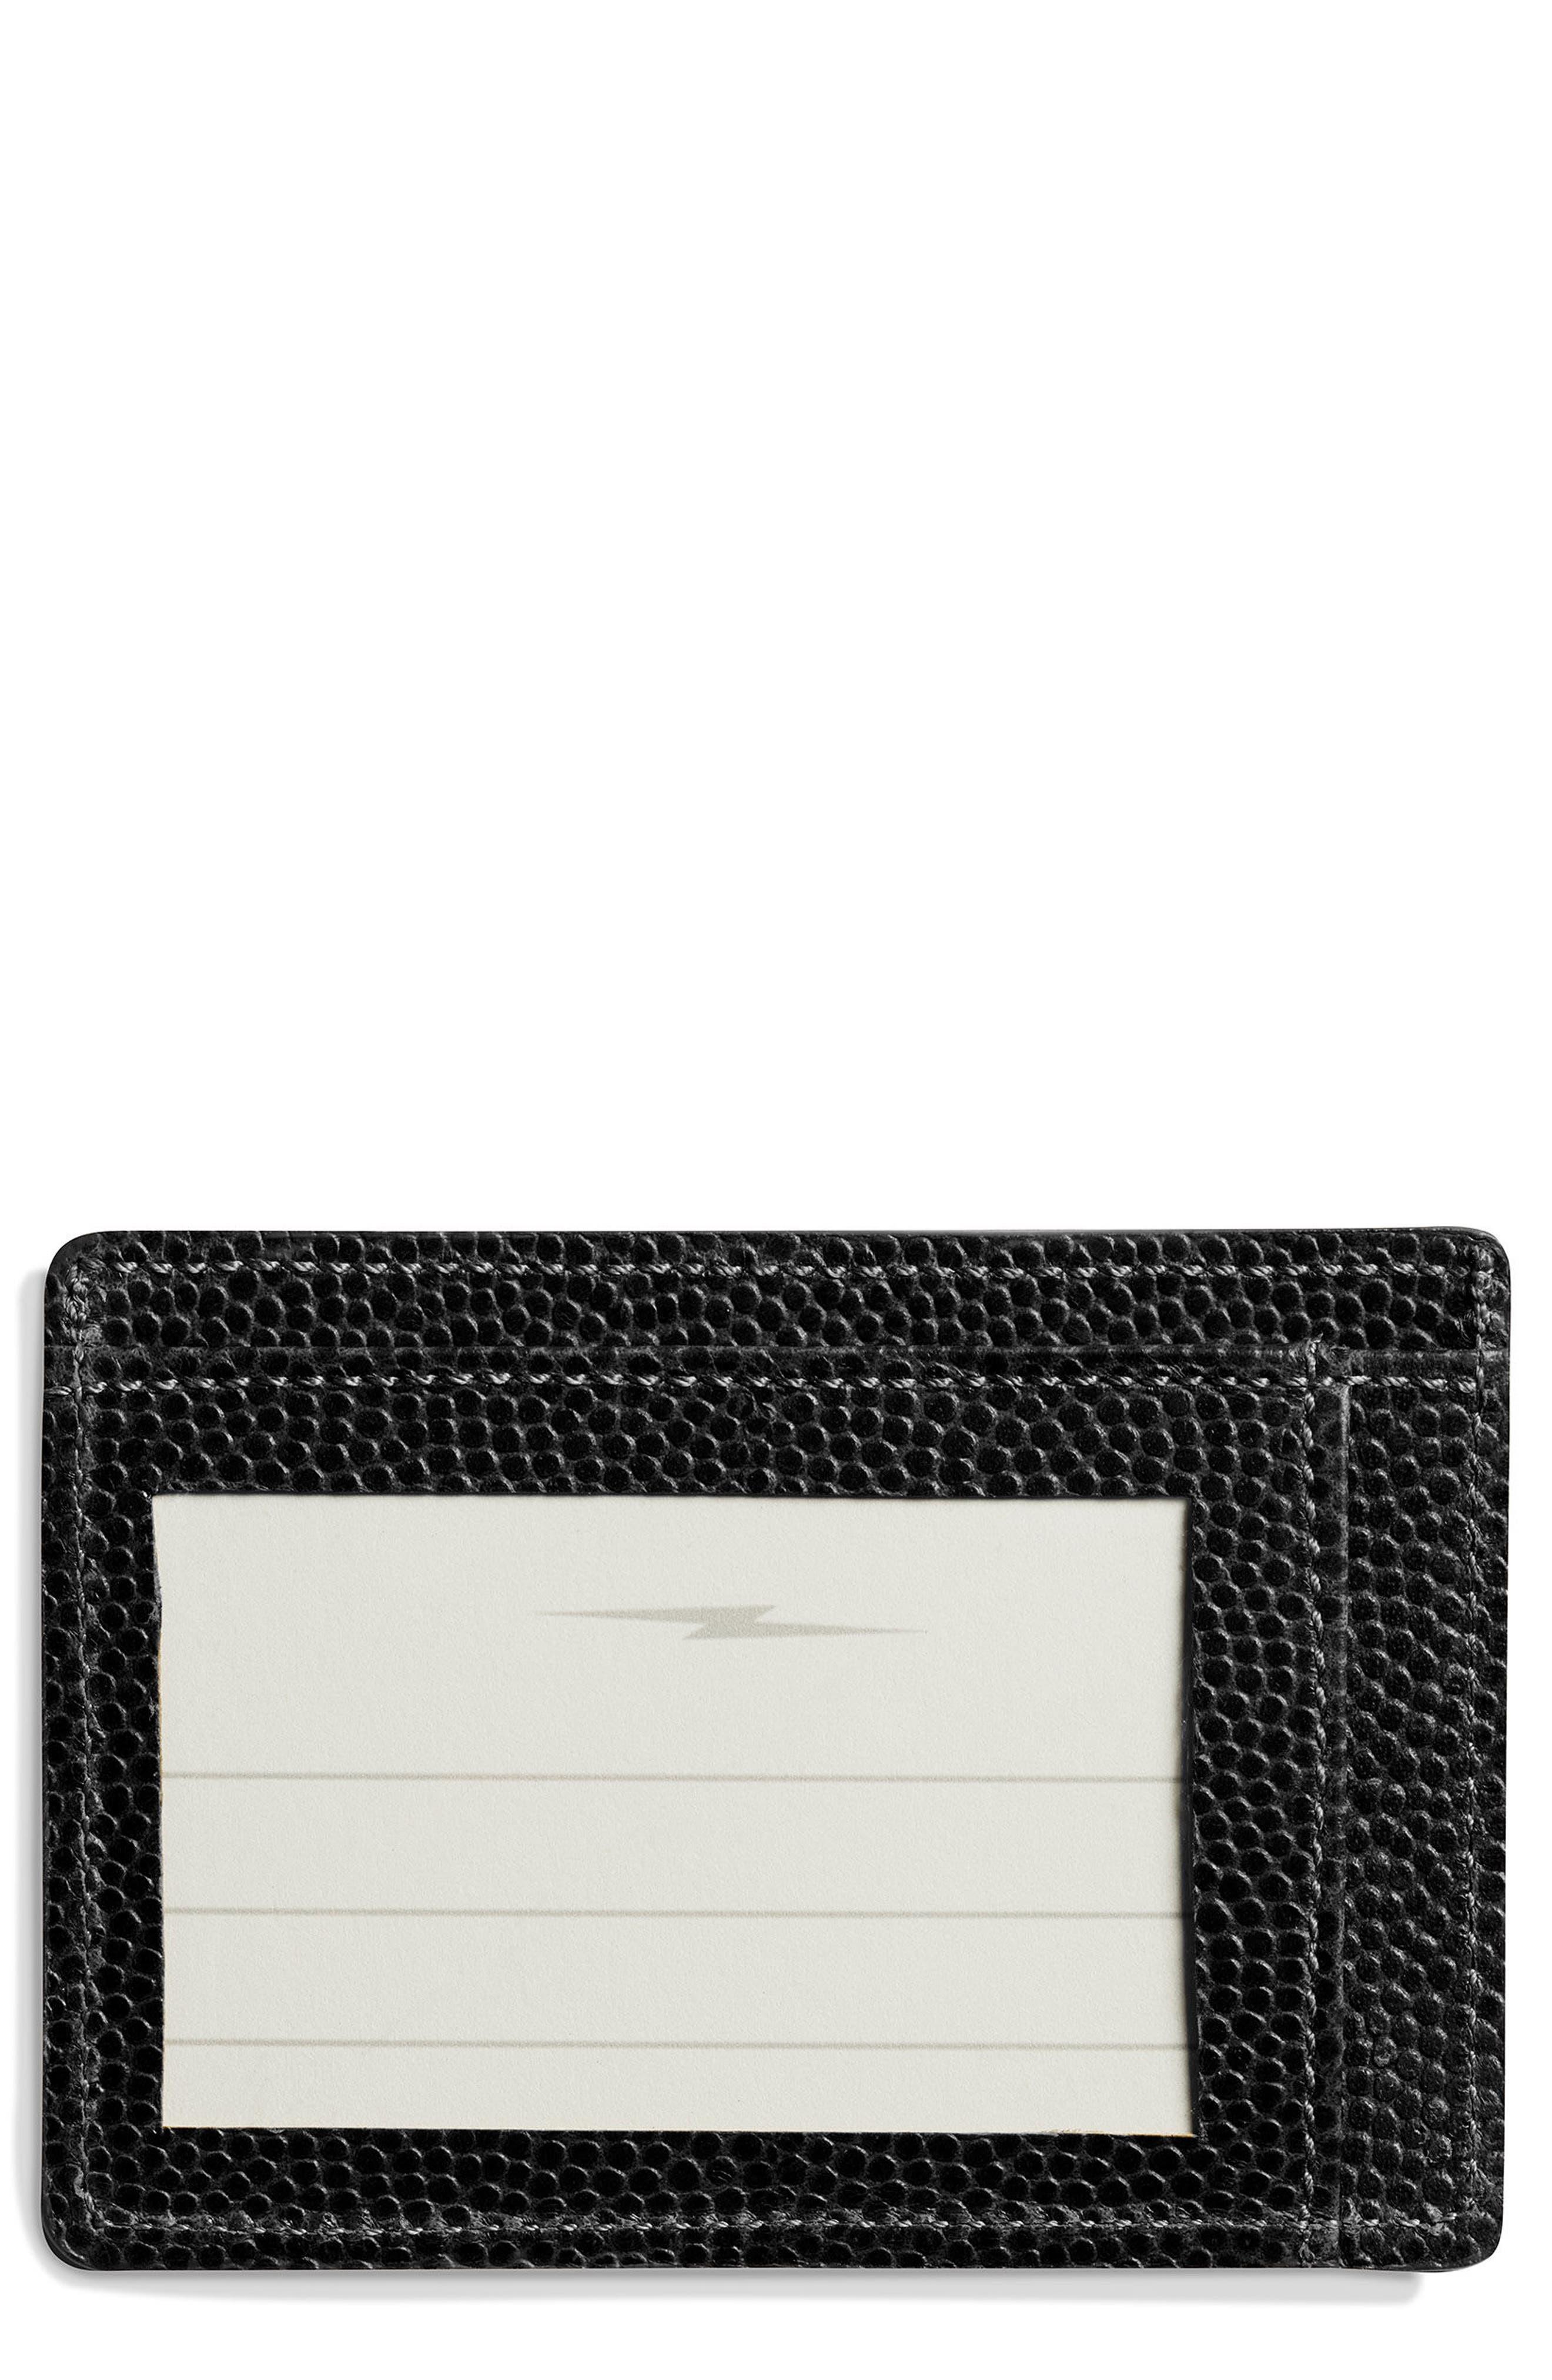 Main Image - Shinola Latigo Leather Card Case